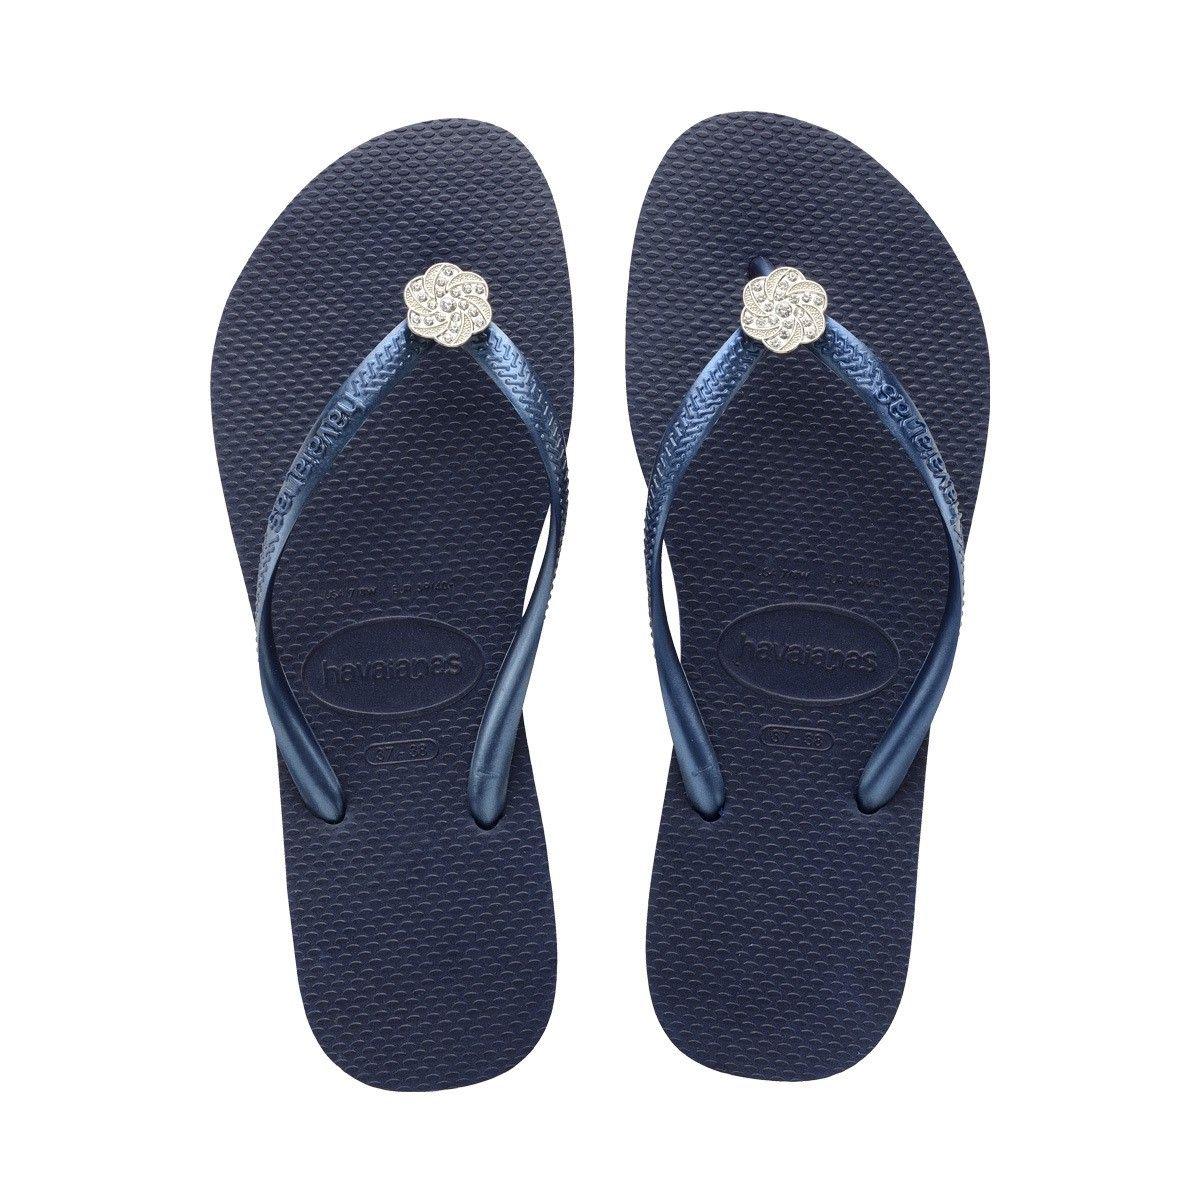 20f09d69b HAVAIANAS SLIM CRYSTAL POEM NAVY BLUE NAVY BLUE.  havaianas  shoes  all